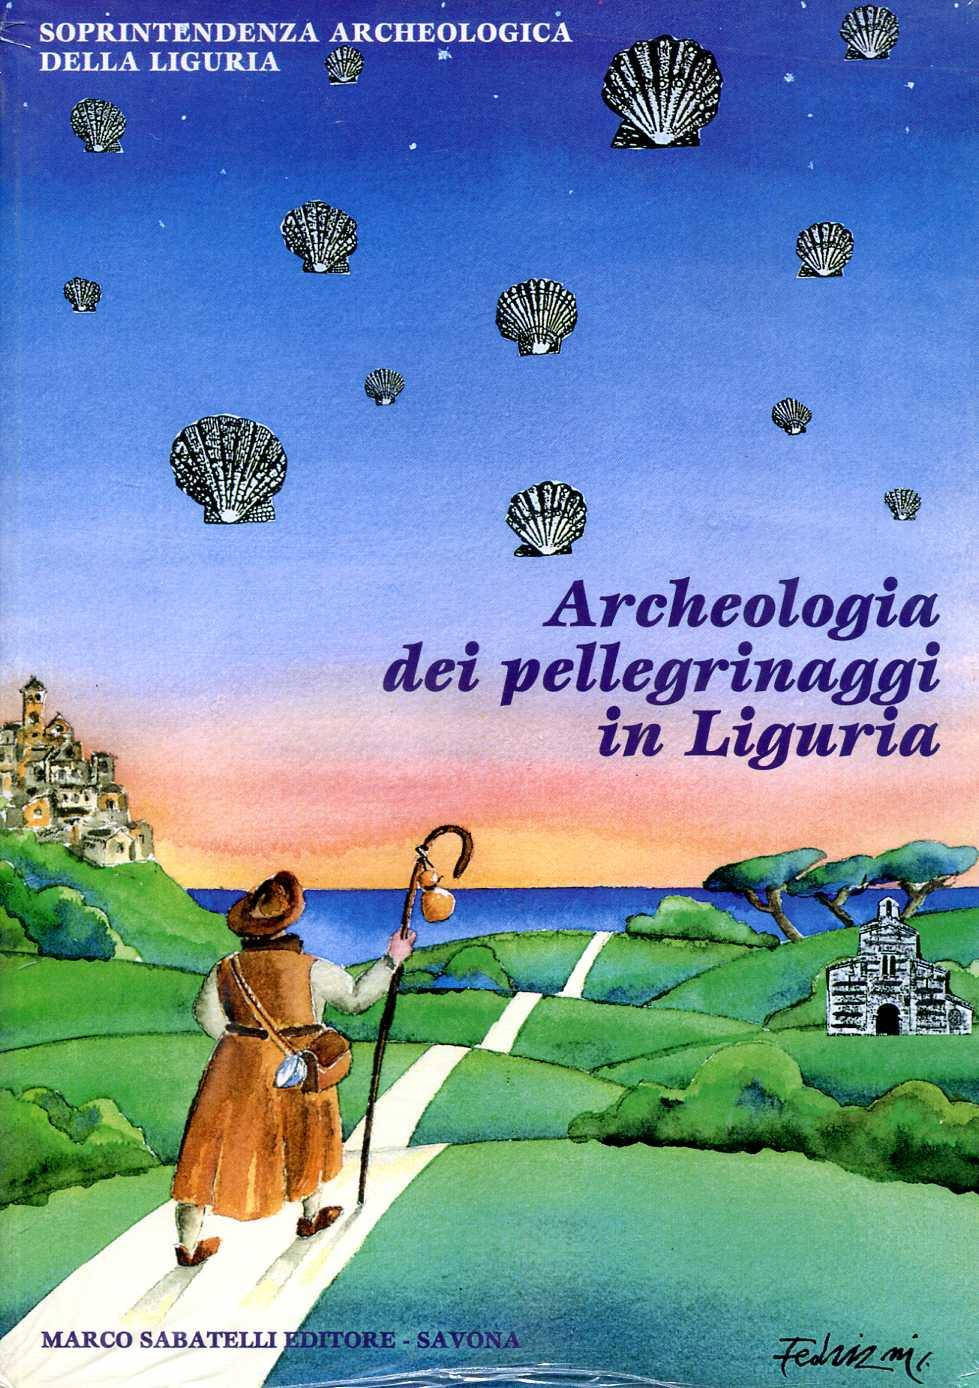 Archeologia dei pellegrinaggi in Liguria